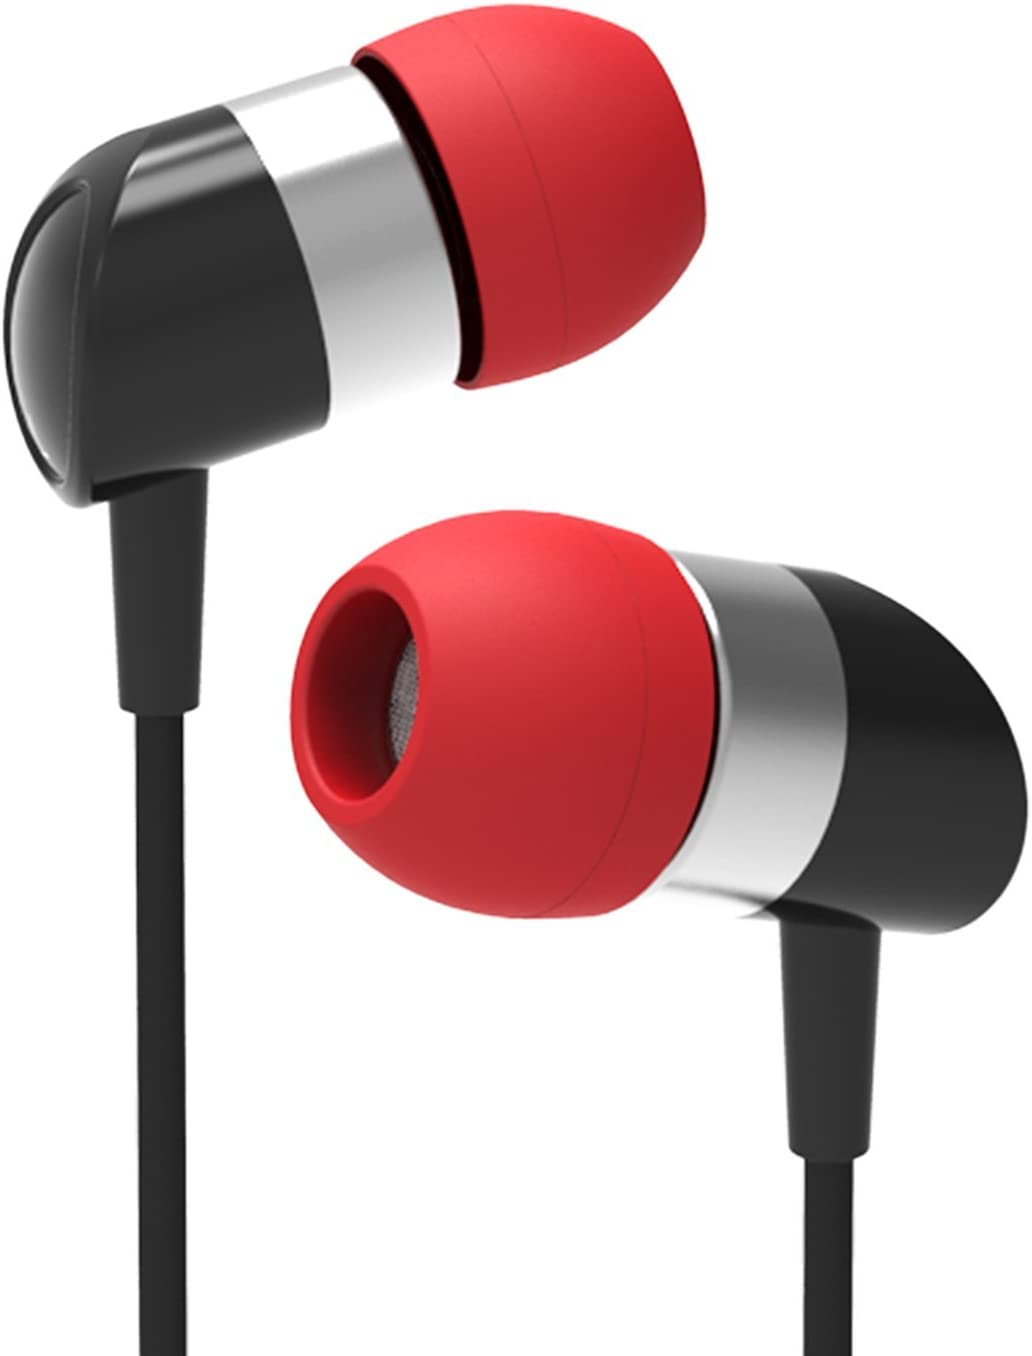 Challenge the lowest price of Japan ECCI PR200 MK2 List price HiFi in-Ear and Red Black Headphones